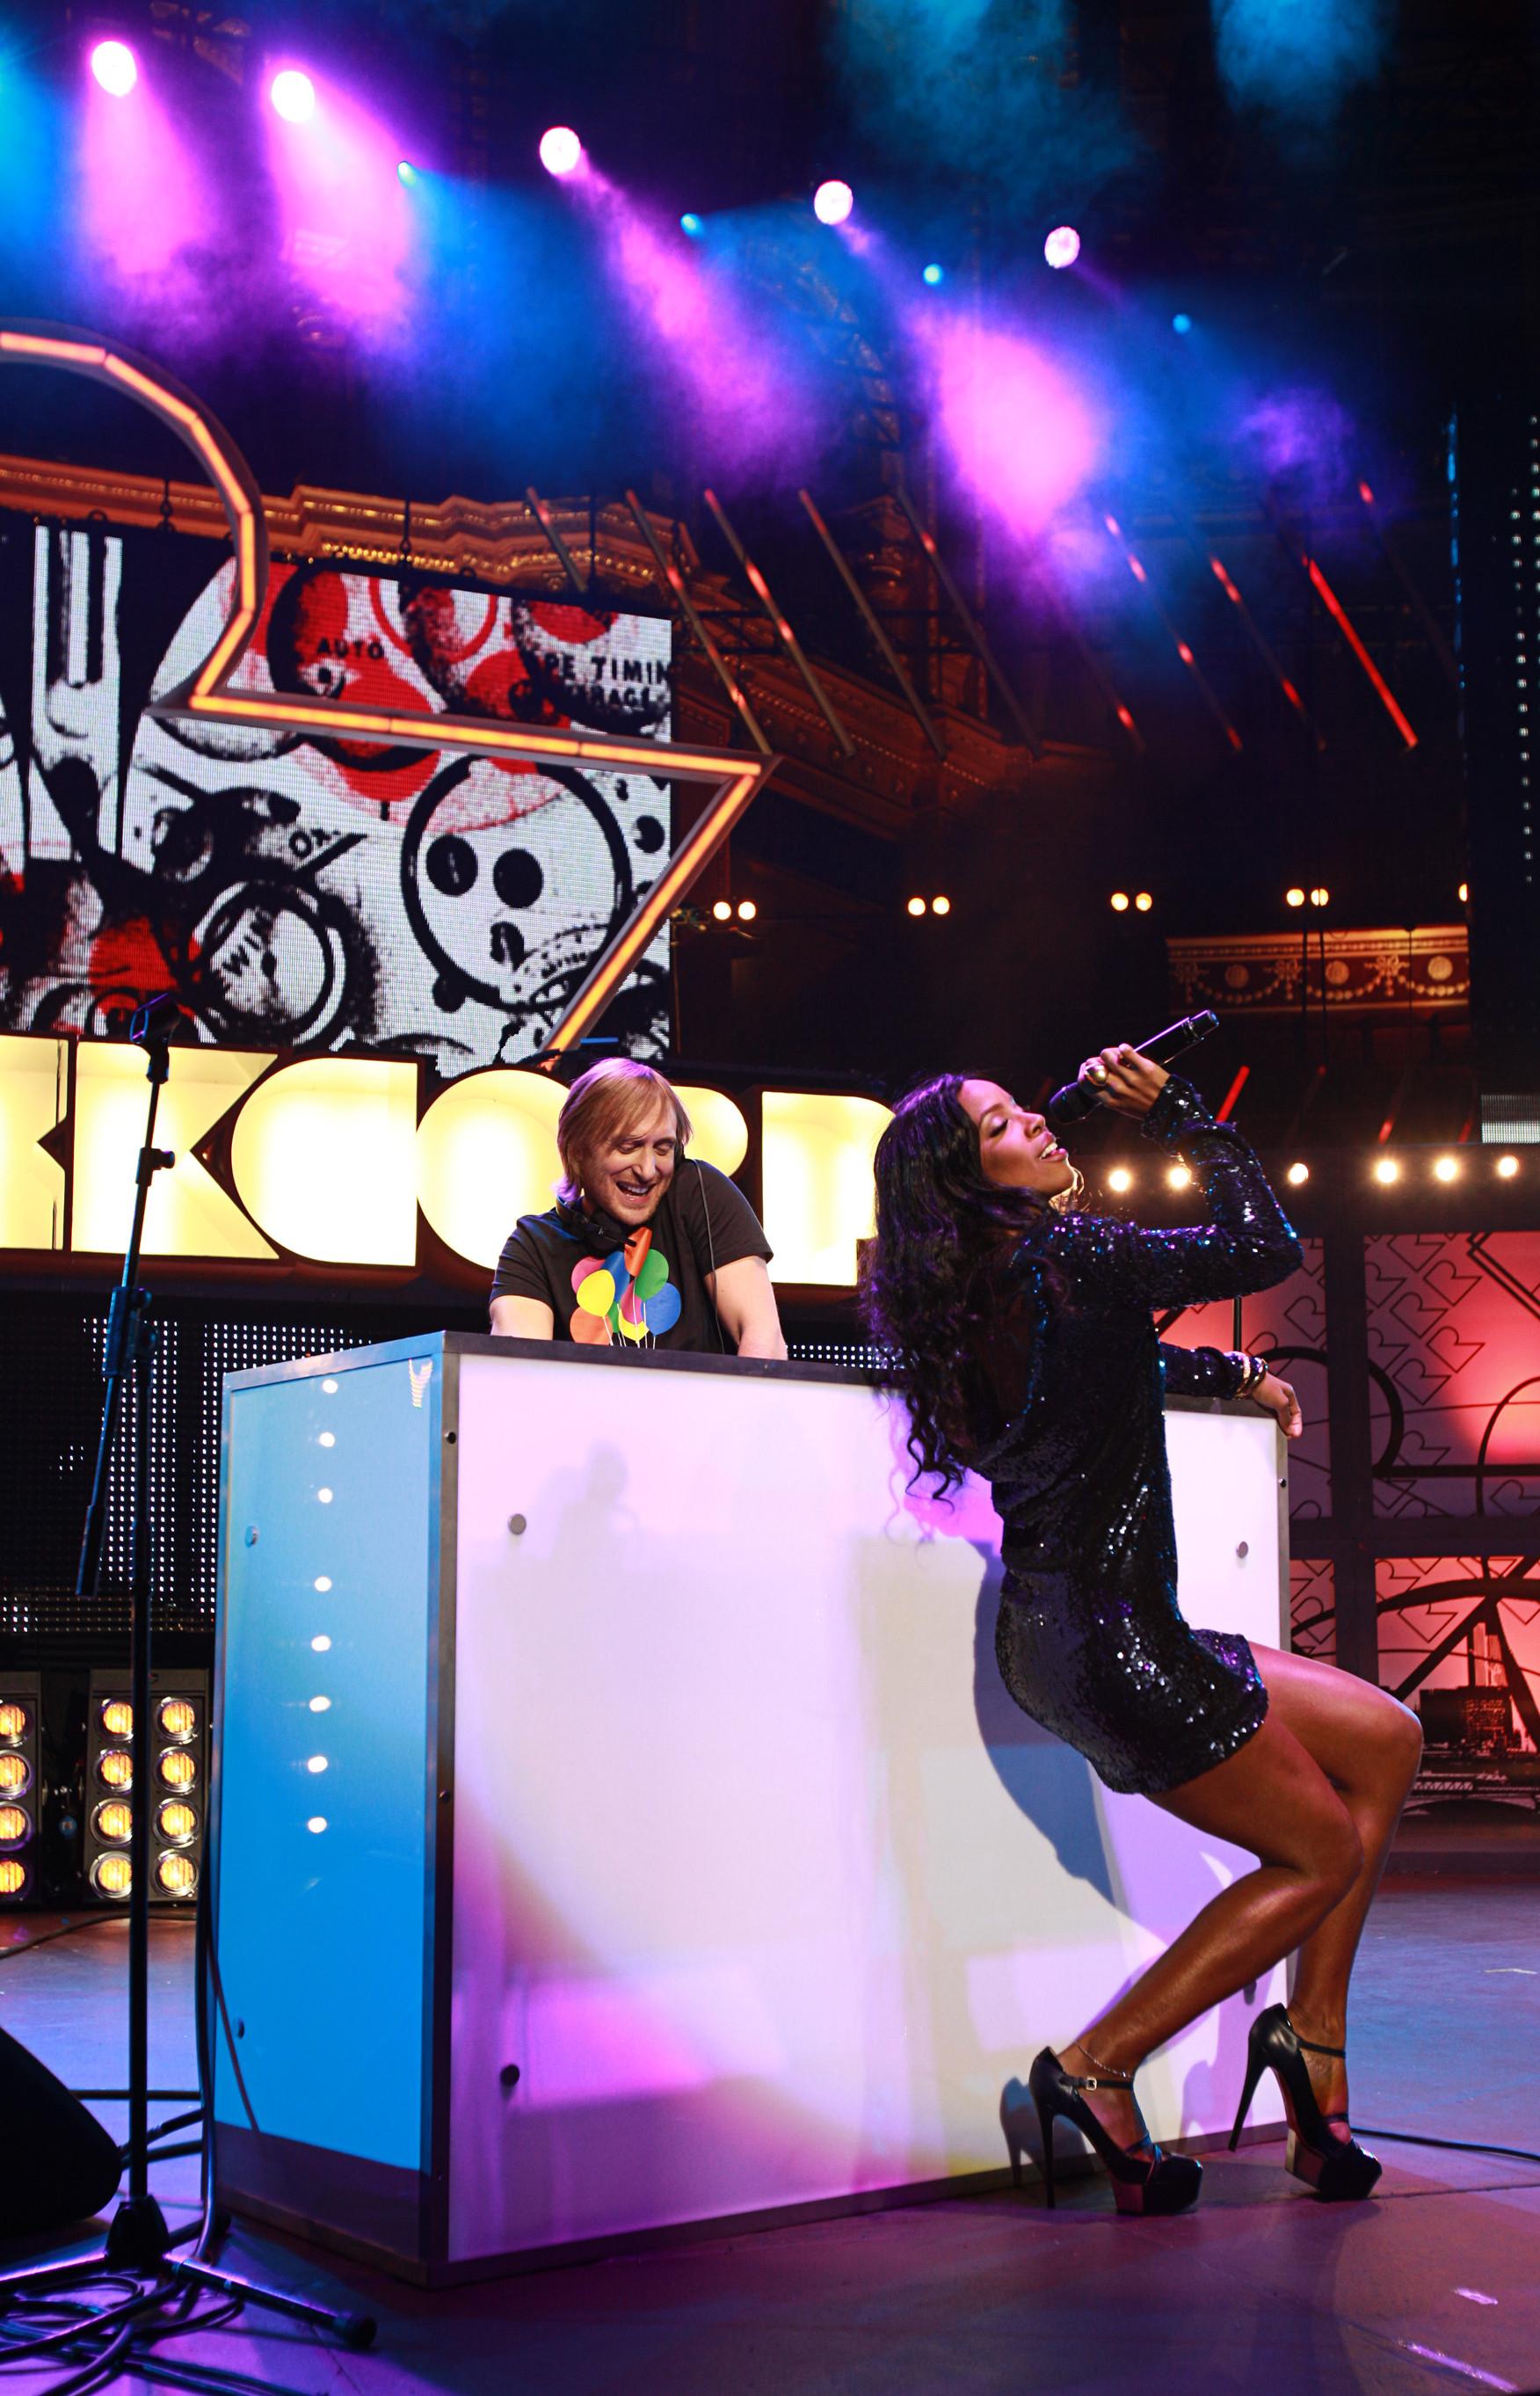 David Guetta and Kelly Rowland